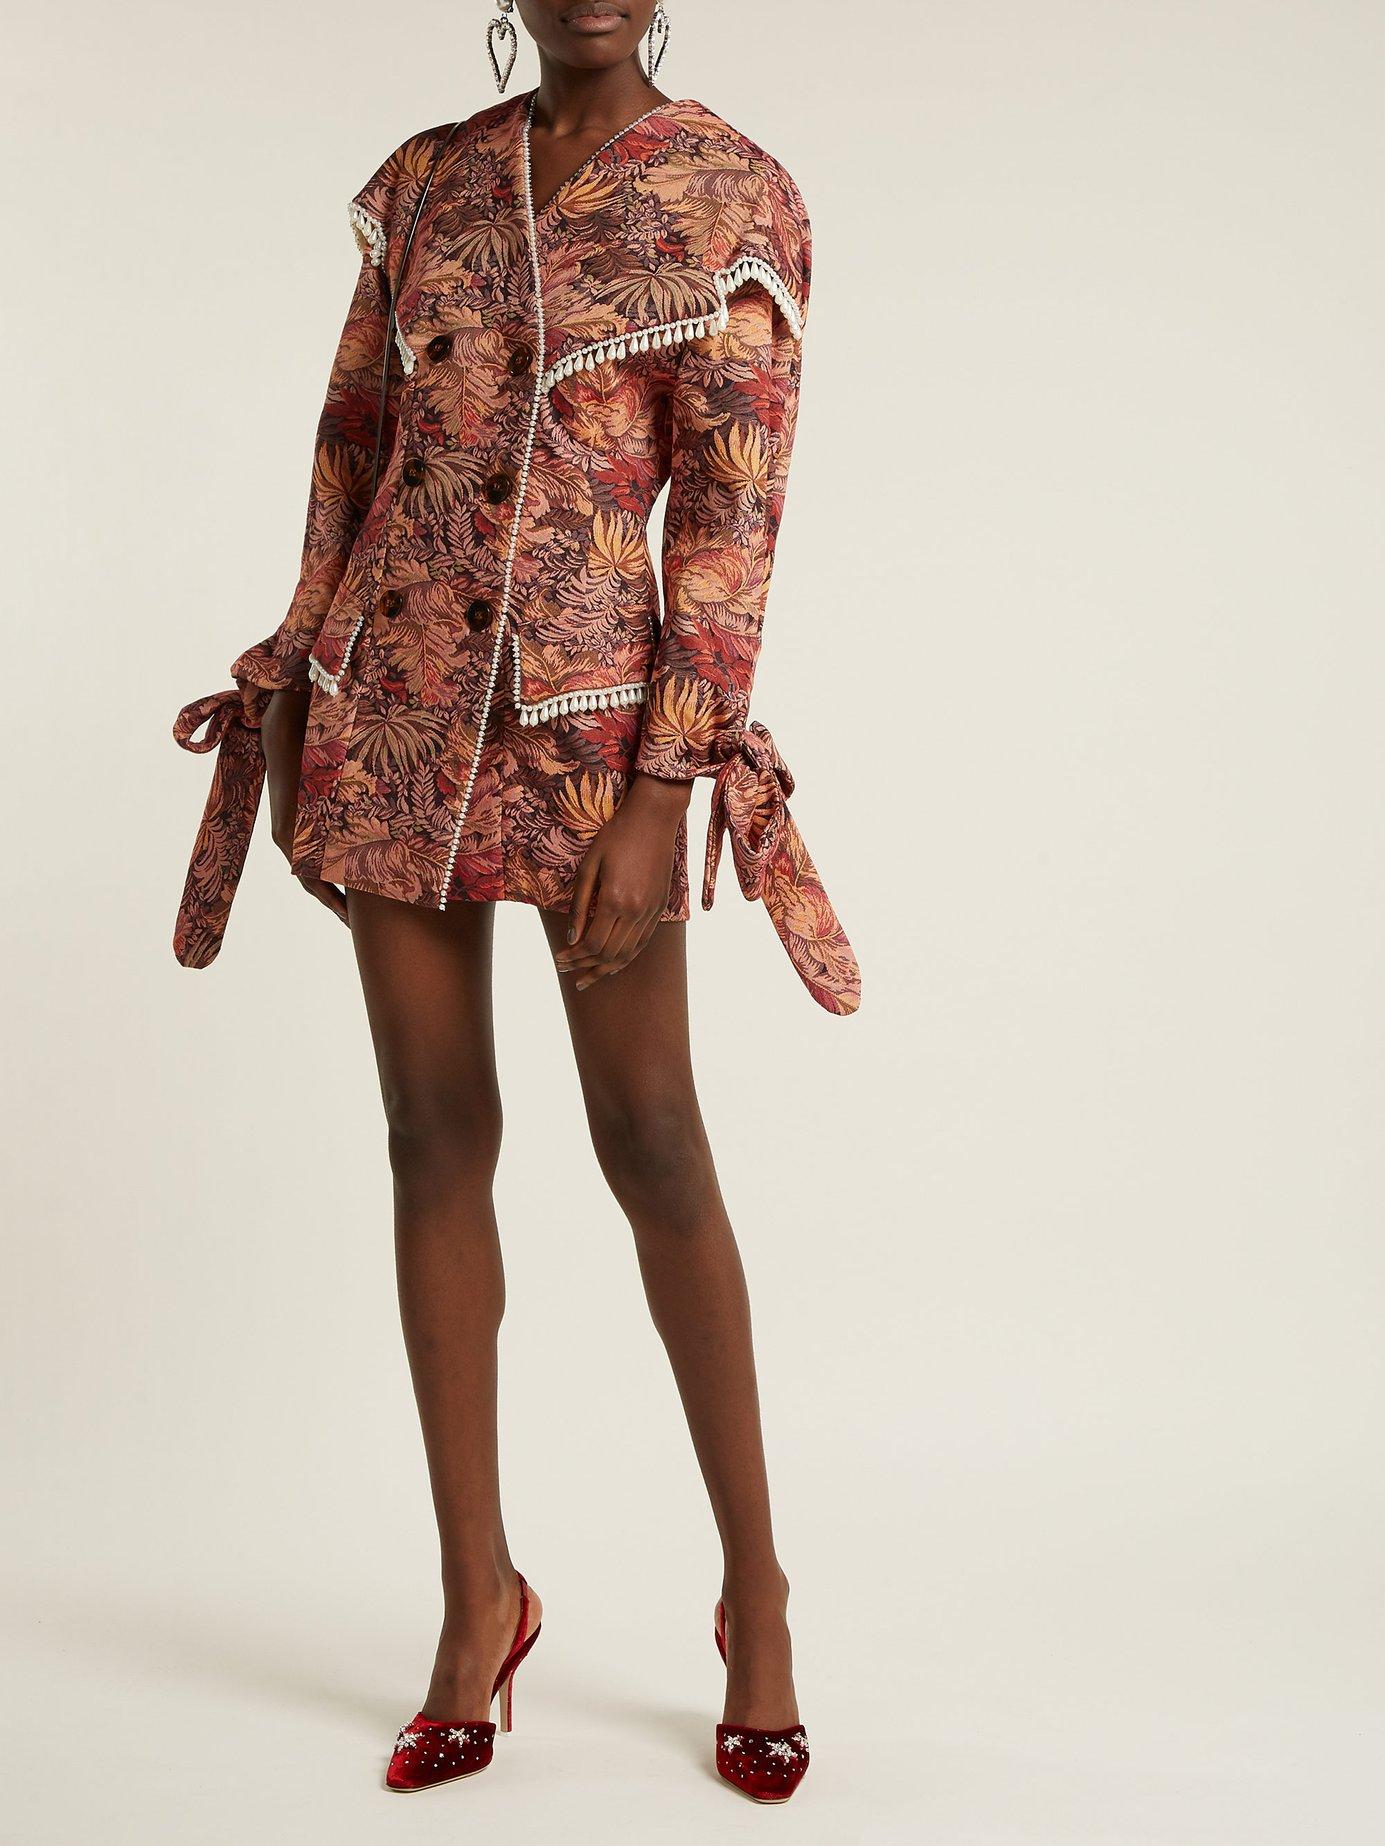 Floral tapestry brocade mini dress by Attico